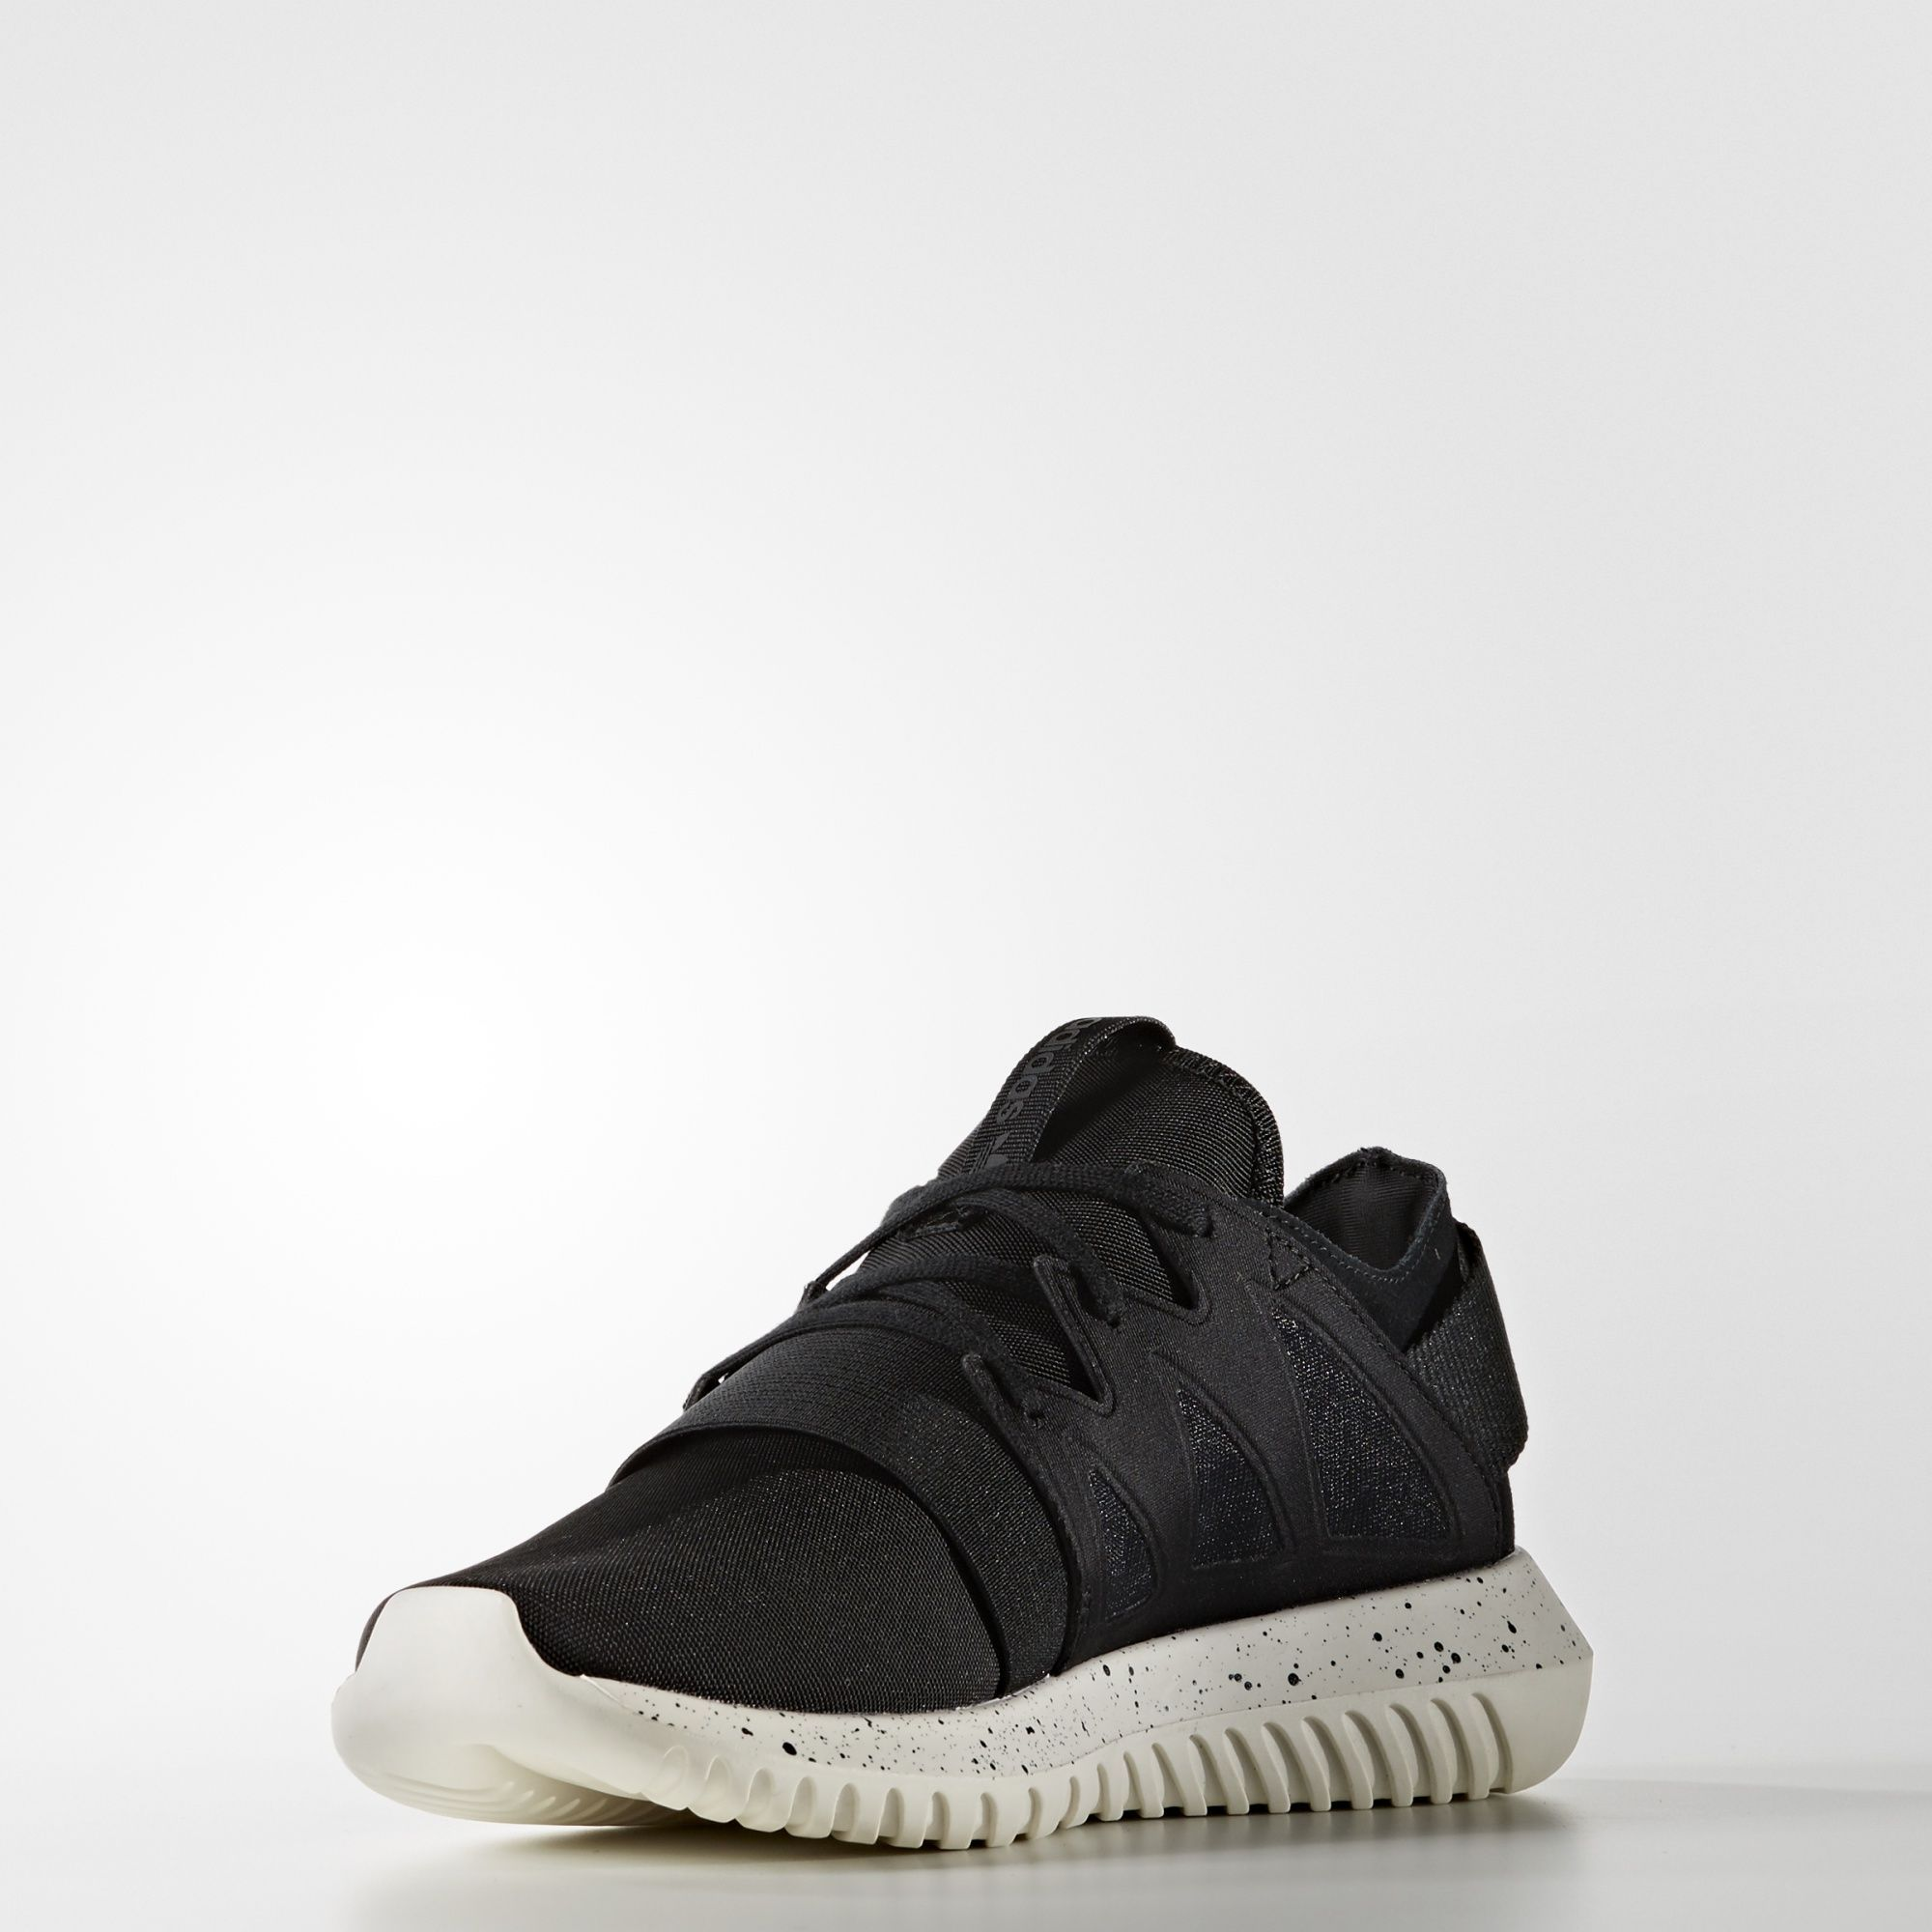 adidas Chaussure Tubular Viral Chaussures Pinterest Tubular Chaussures